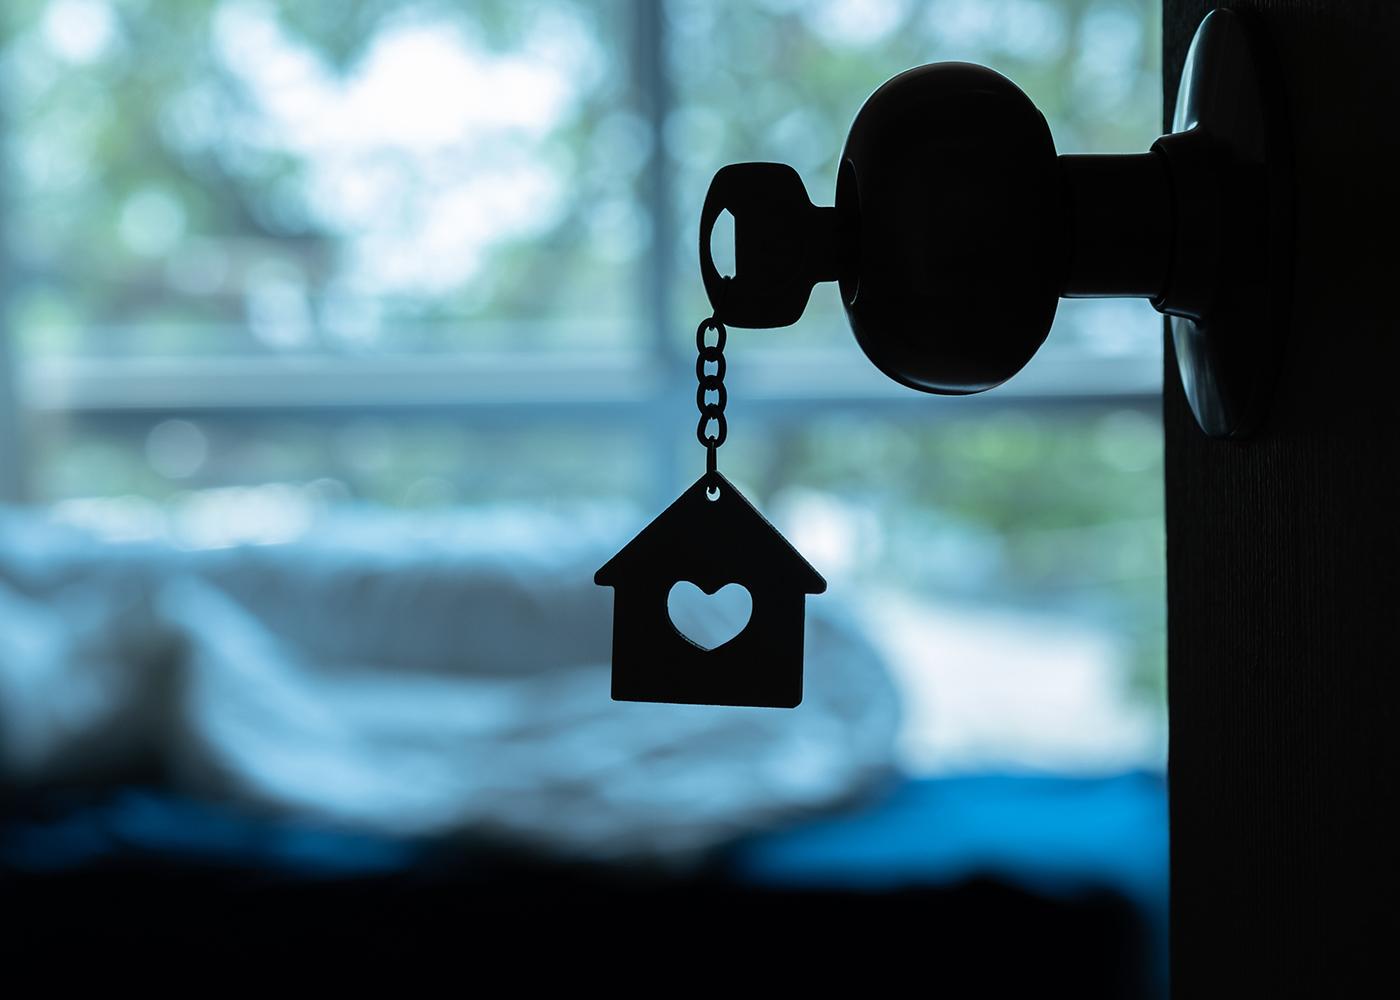 chave fechadura casa